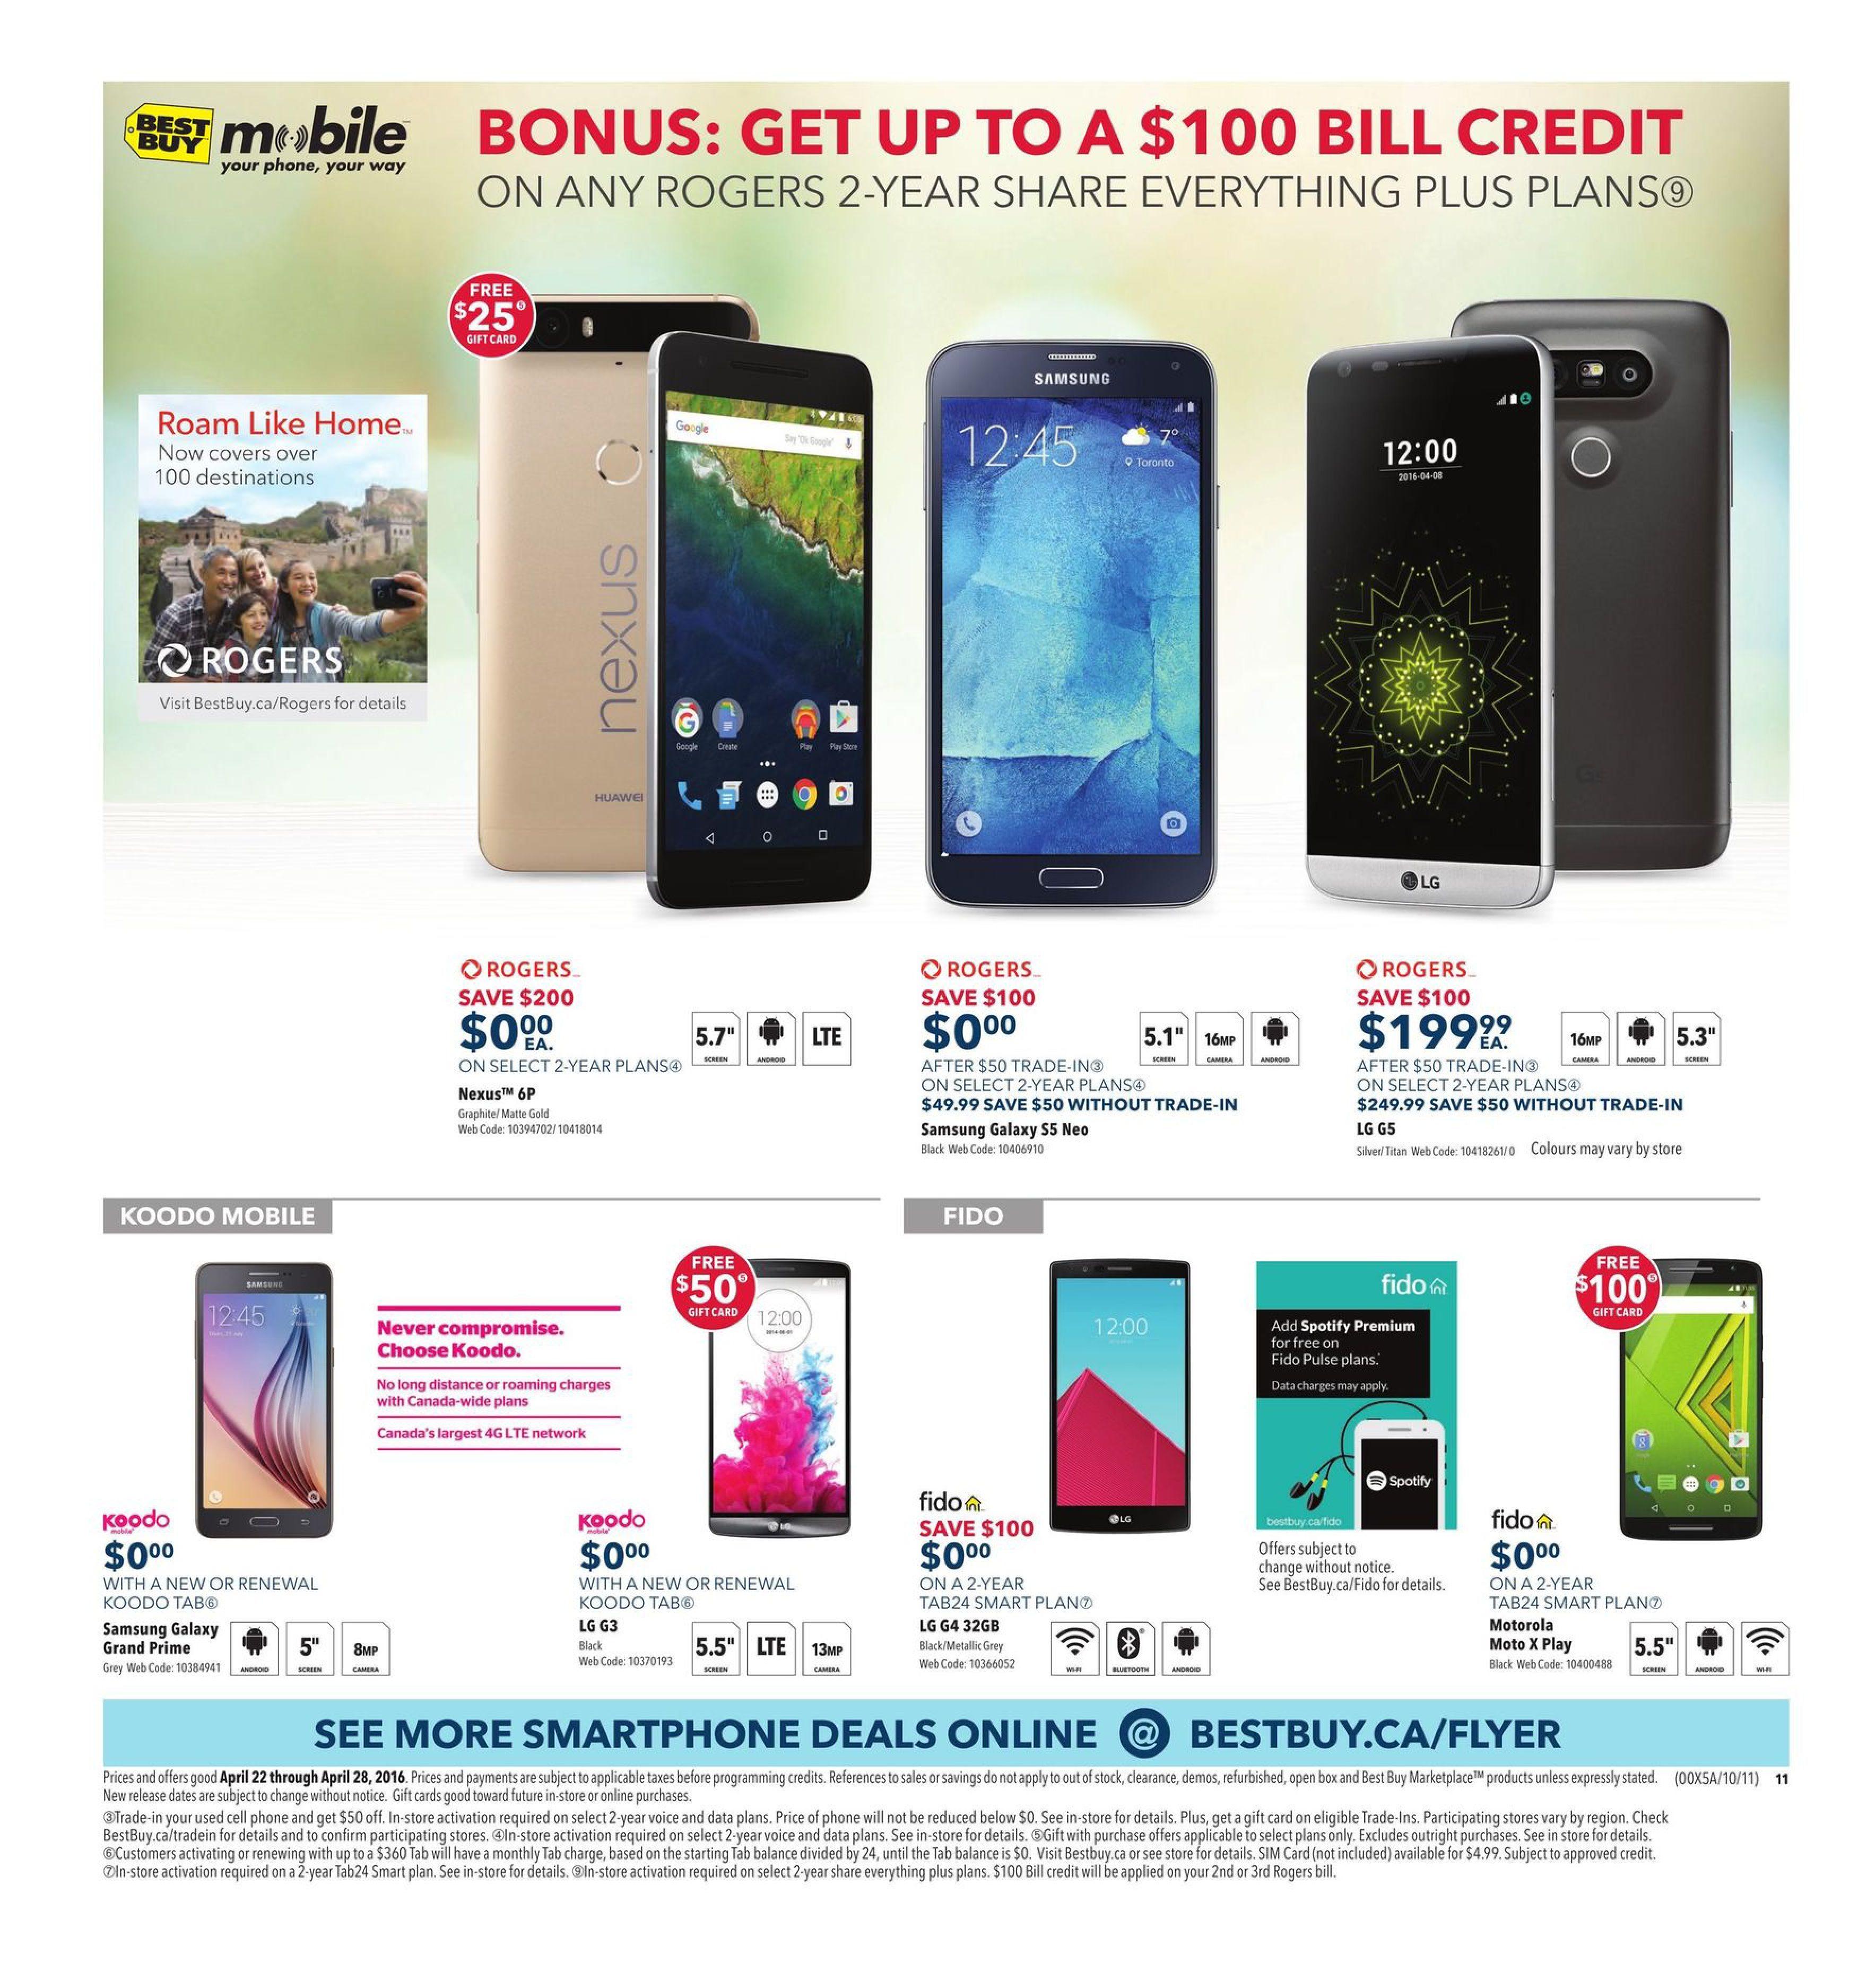 Best Buy Weekly Flyer - Weekly - Work Smart, Save Smarter